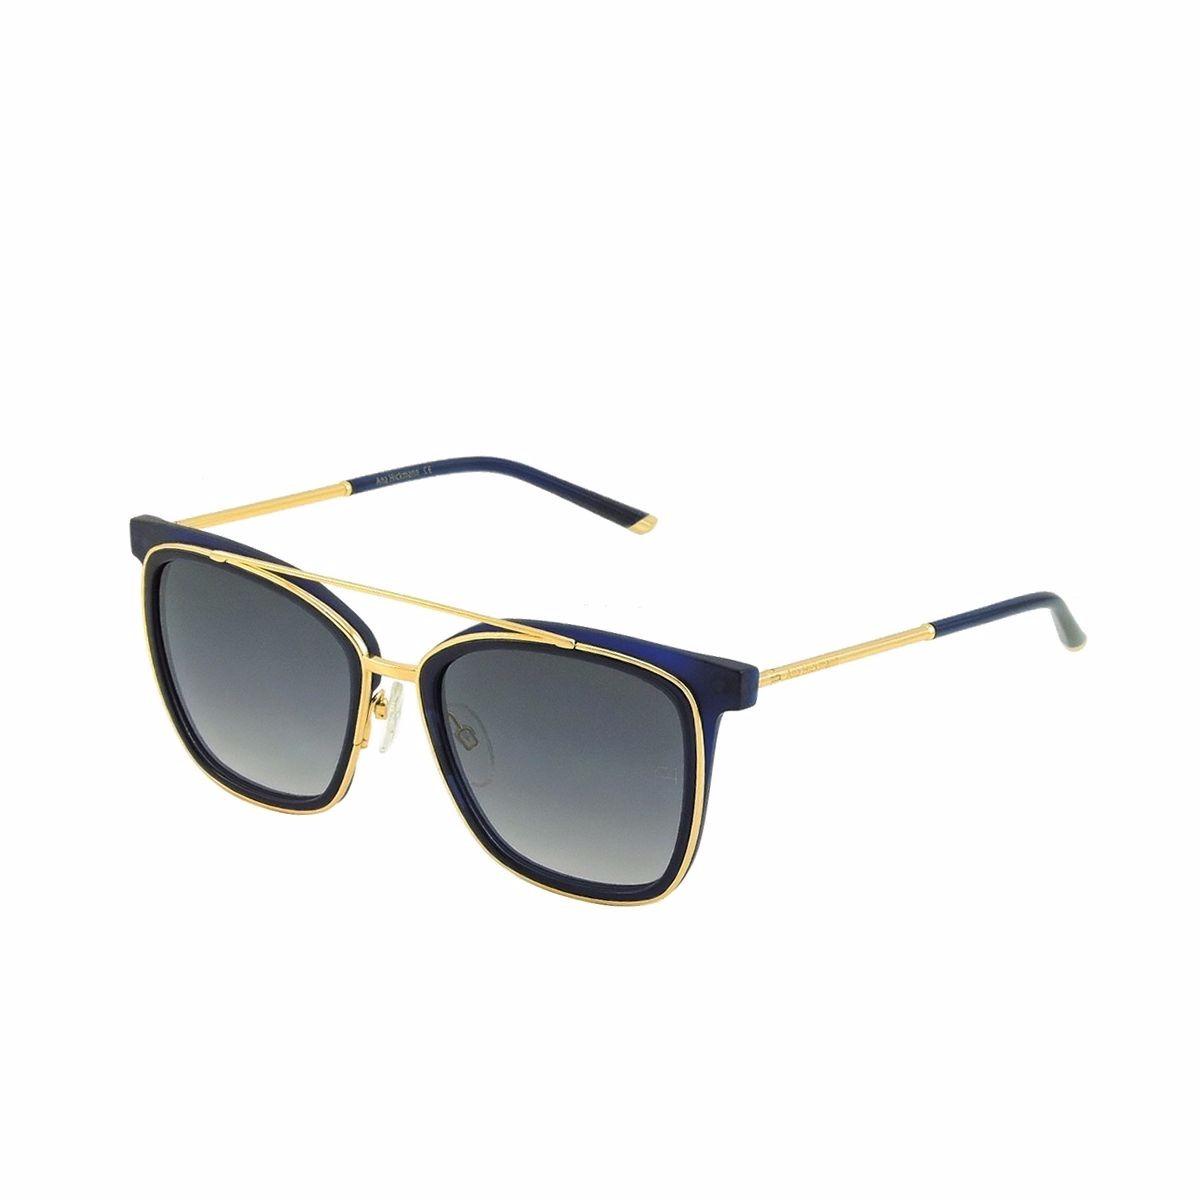 6f05ab8faa3c8 Óculos De Sol Ana Hickmann Ah9247 T02 - R  382